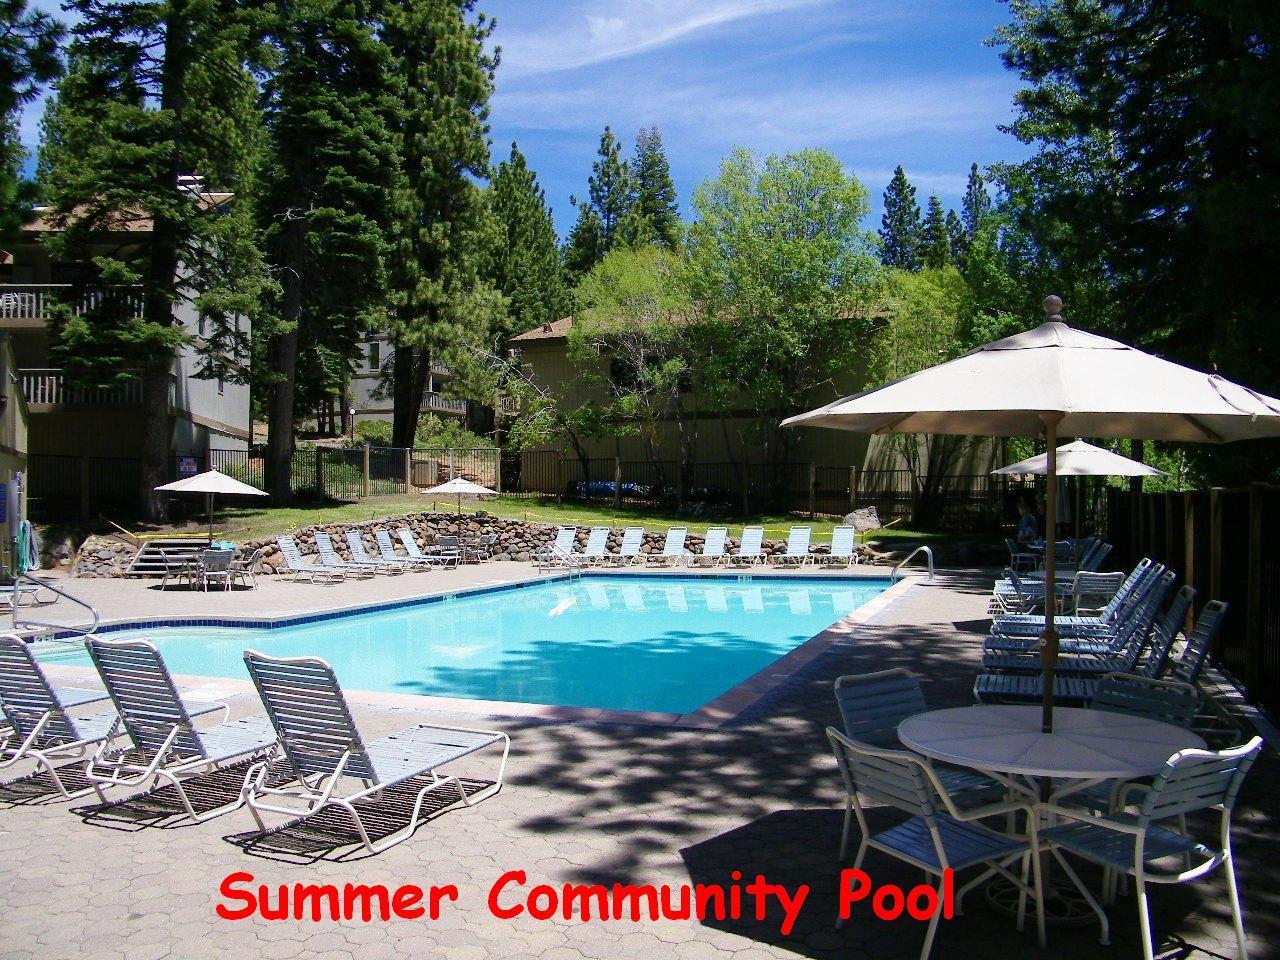 kwc1030 Community Pool